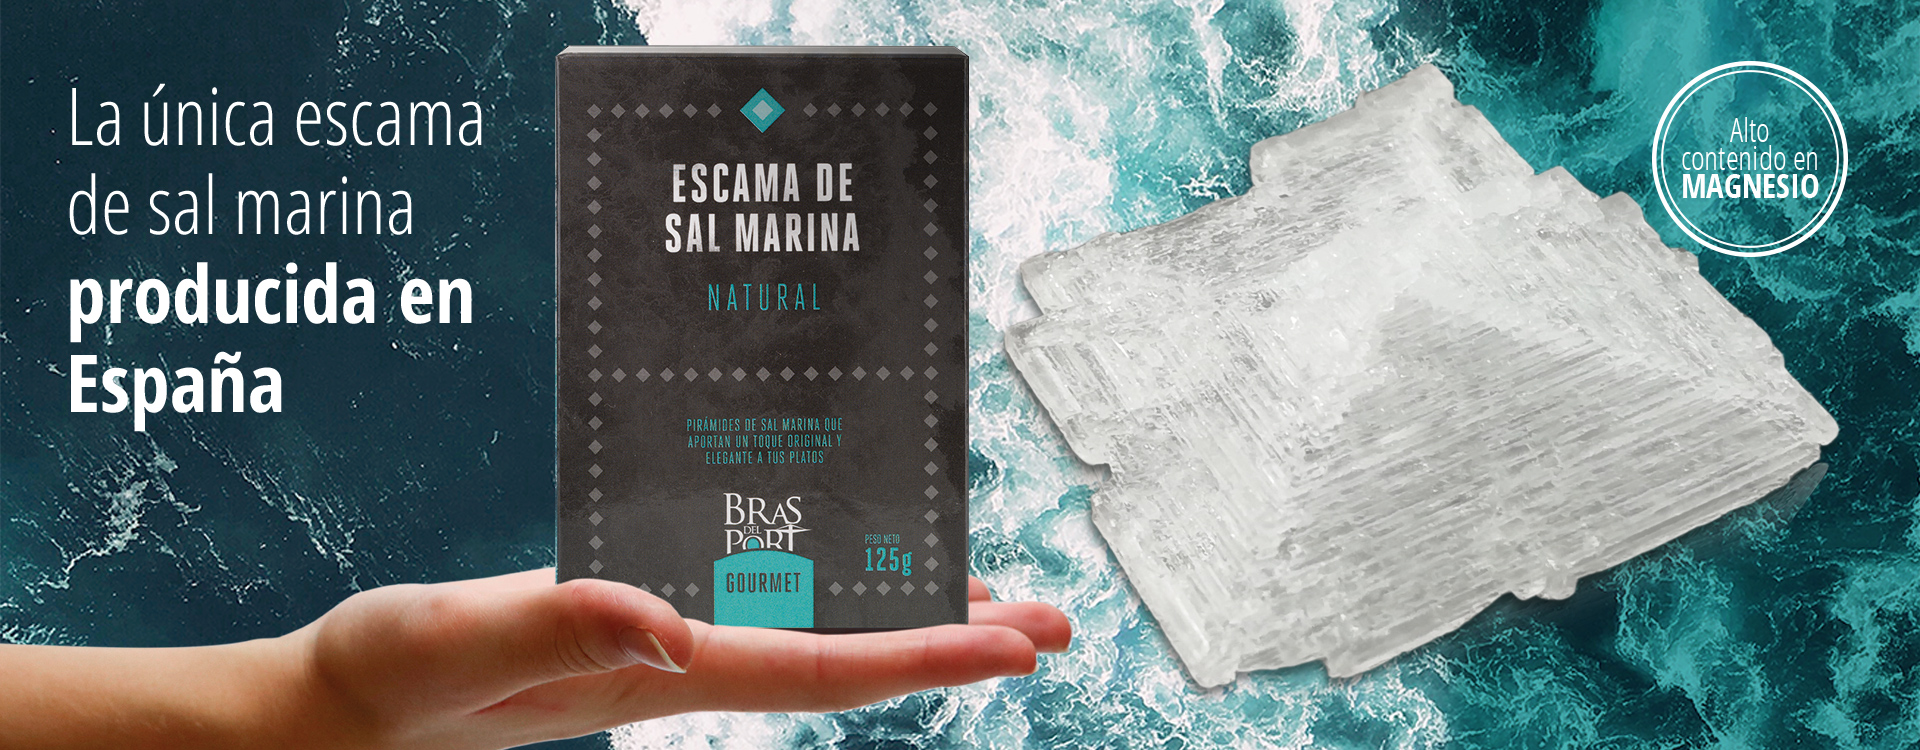 Slider Escama de sal marina